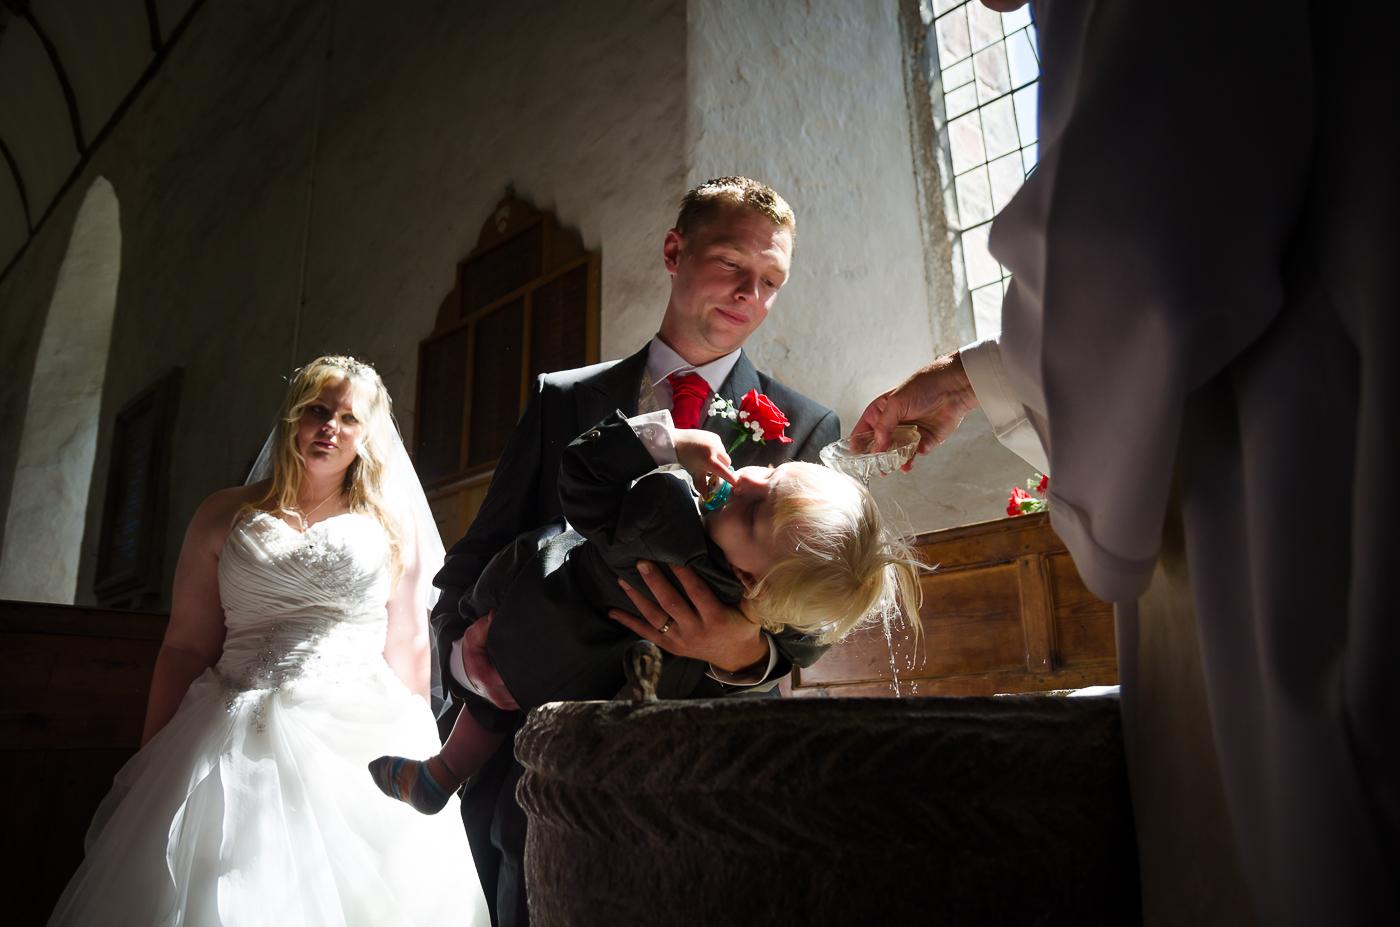 Rupert getting christened